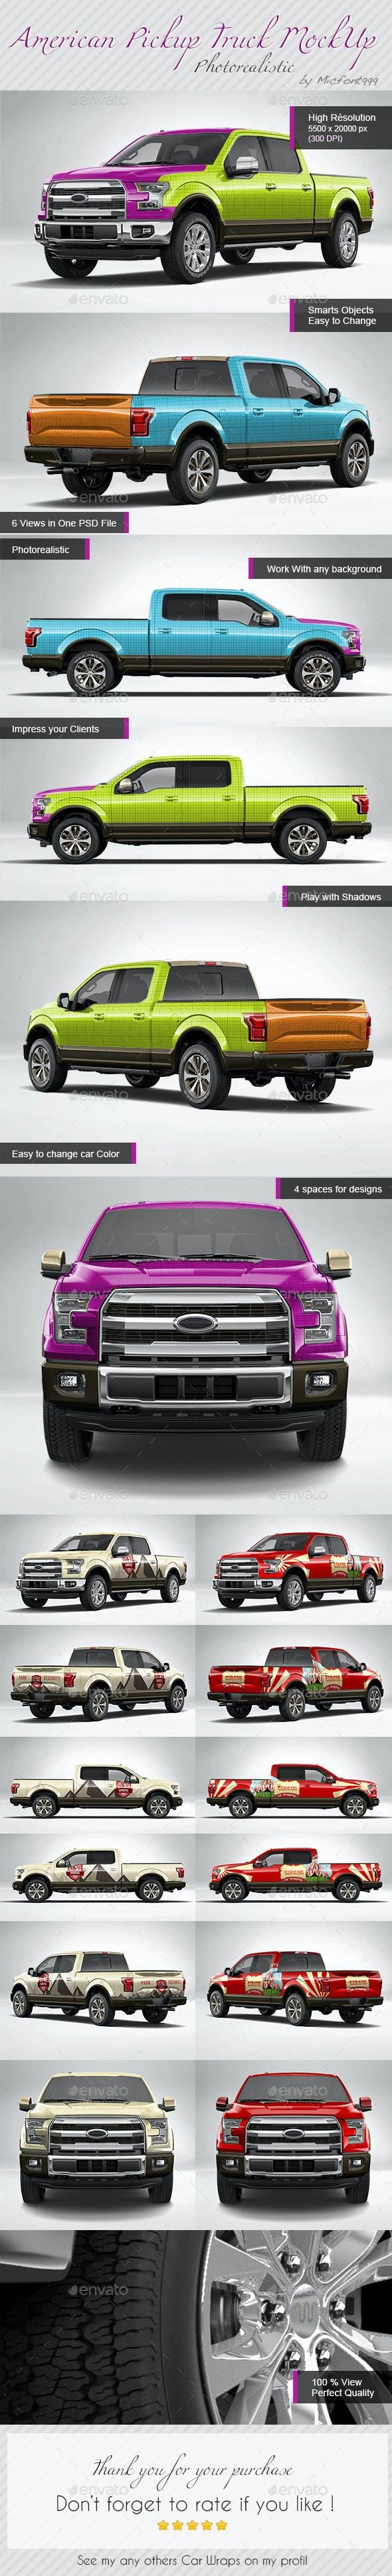 Photorealistic American Pickup Truck Wrap Mock Up